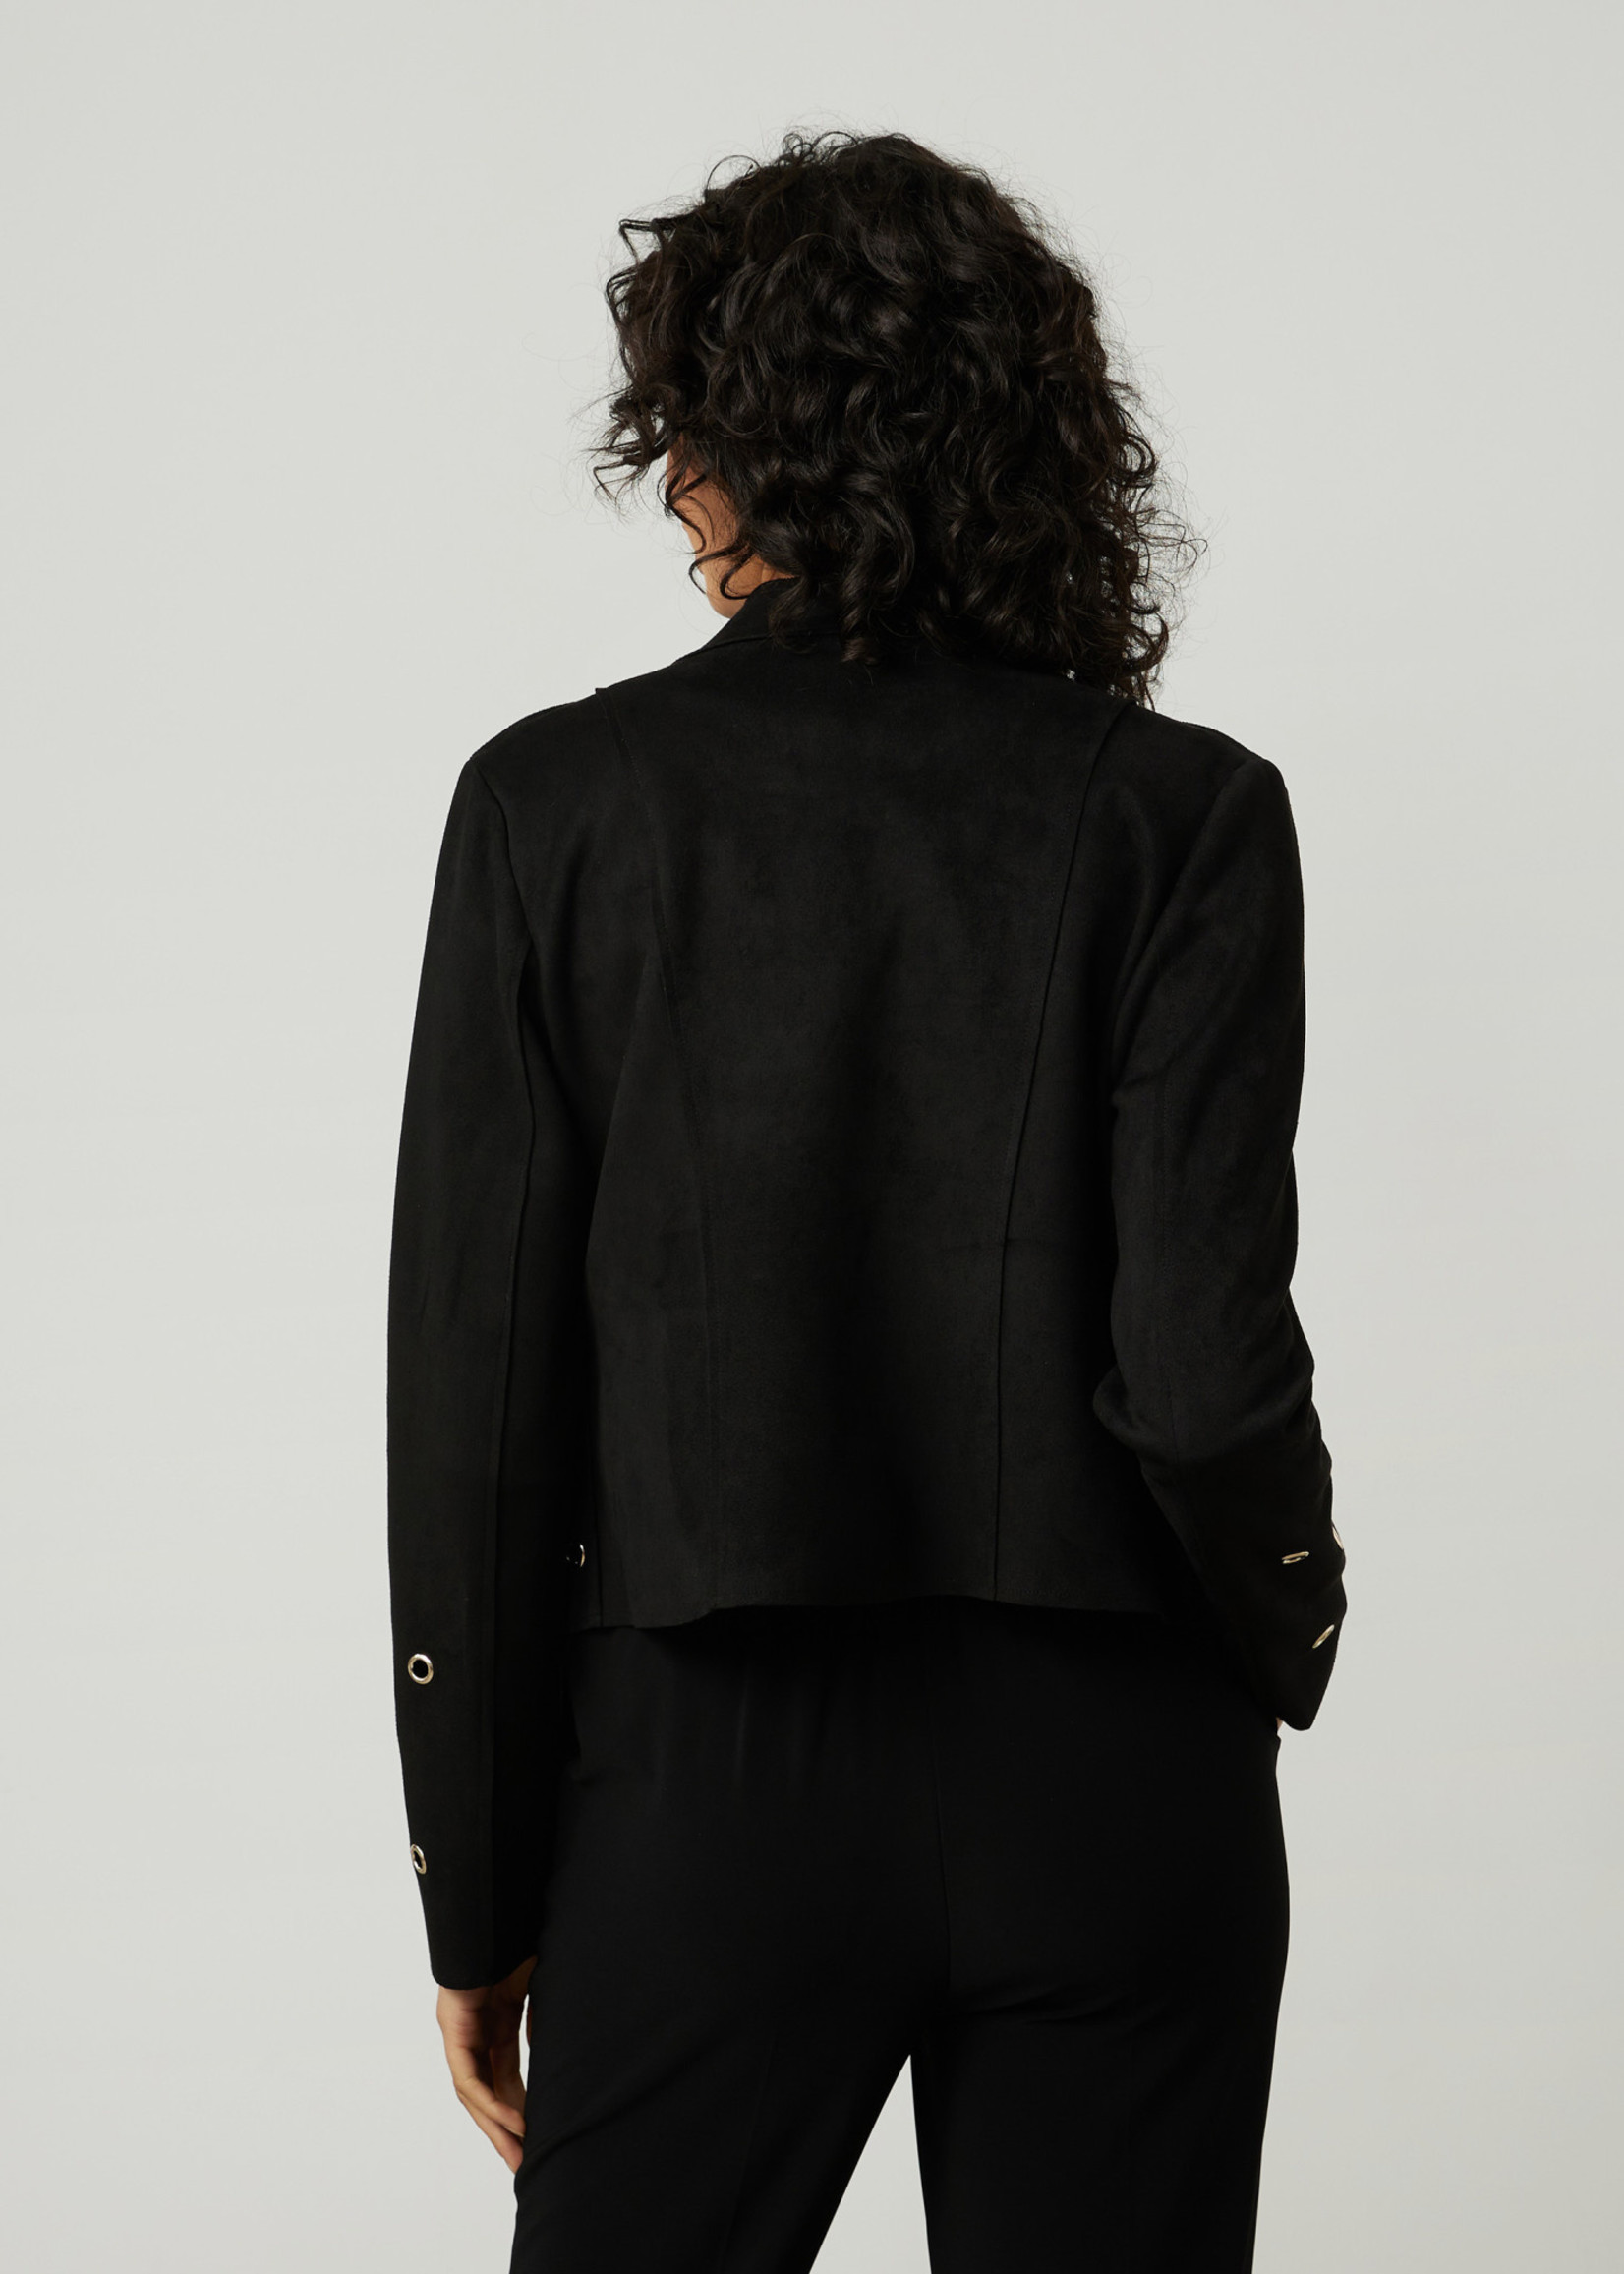 Joseph Ribkoff Joseph Ribkoff  Faux Suede Black Jacket w/Grommets